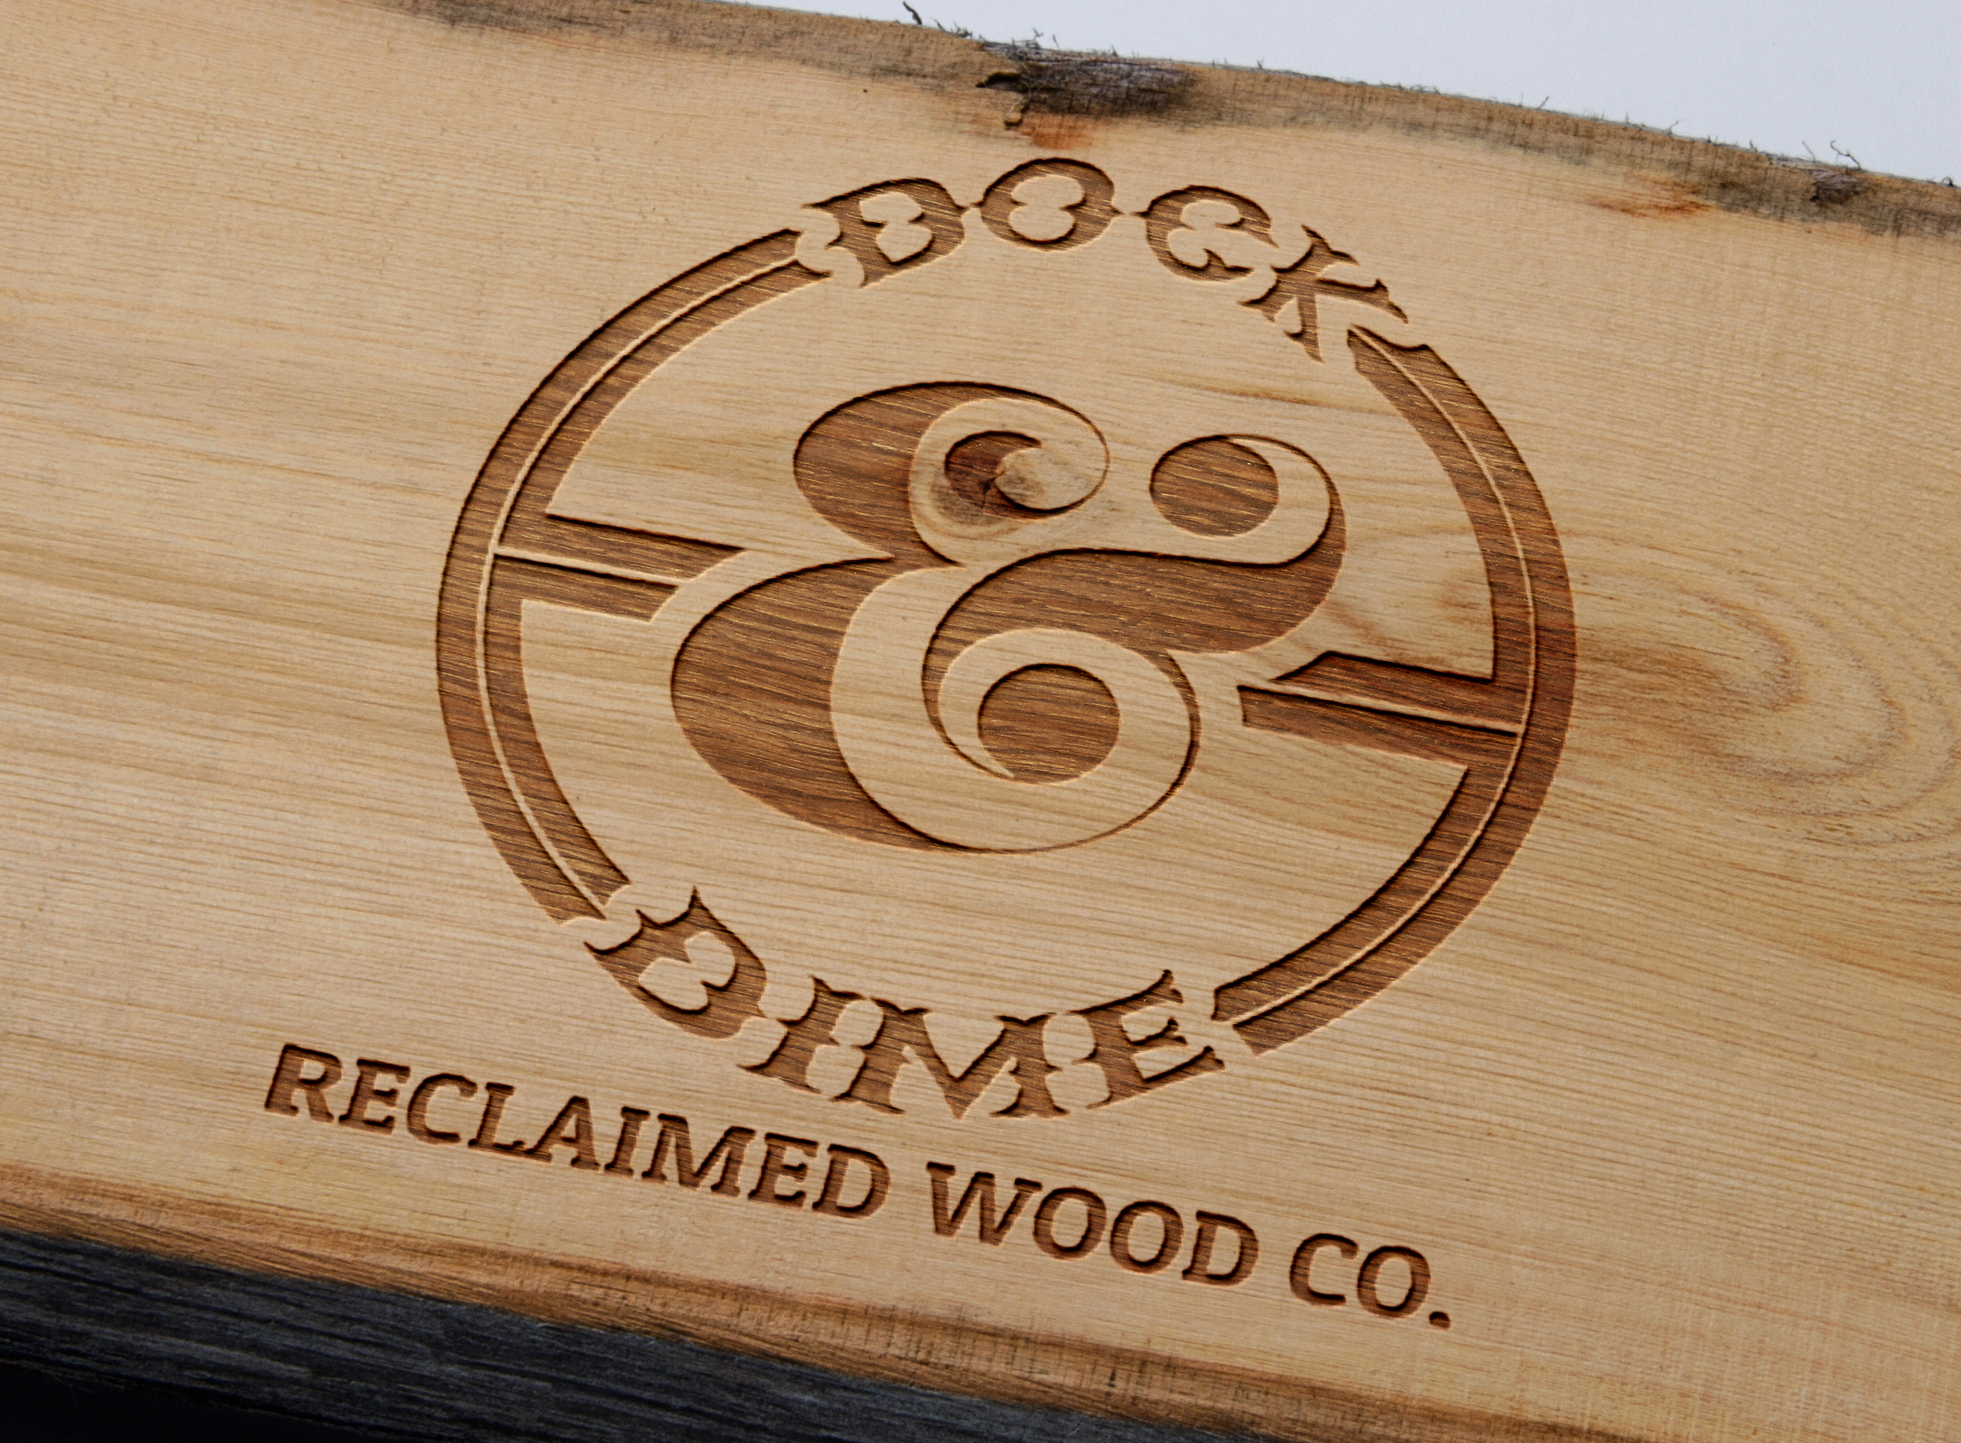 Dock & Dime Reclaimed Wood Co.